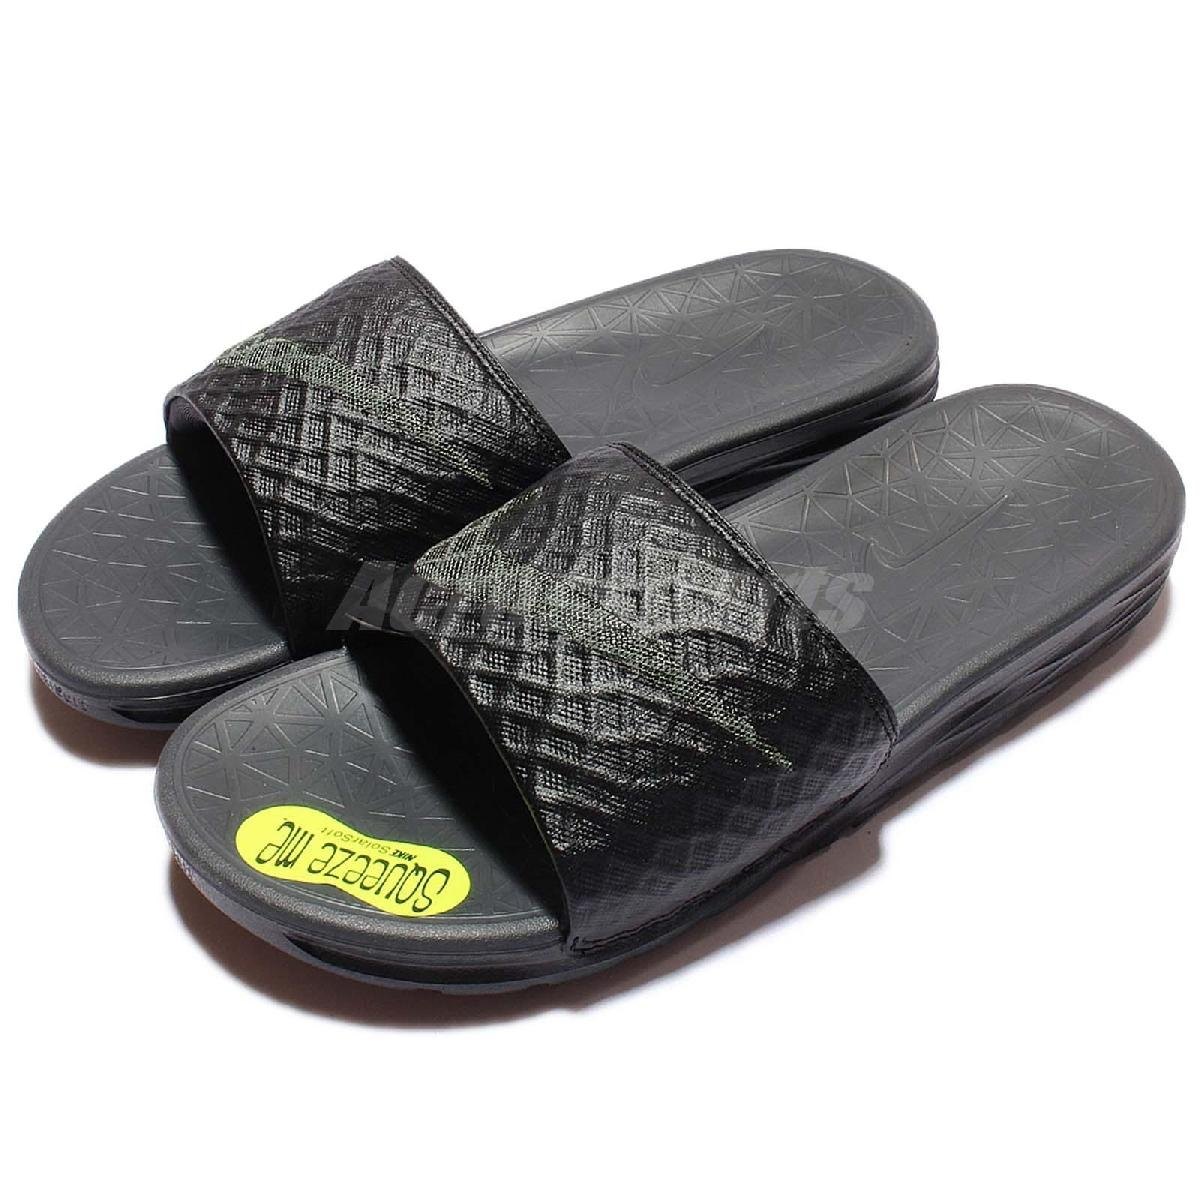 Nike拖鞋Benassi Solarsoft極軟好穿SQUEEZE ME黑灰女鞋小尺碼男鞋PUMP306 705474-091